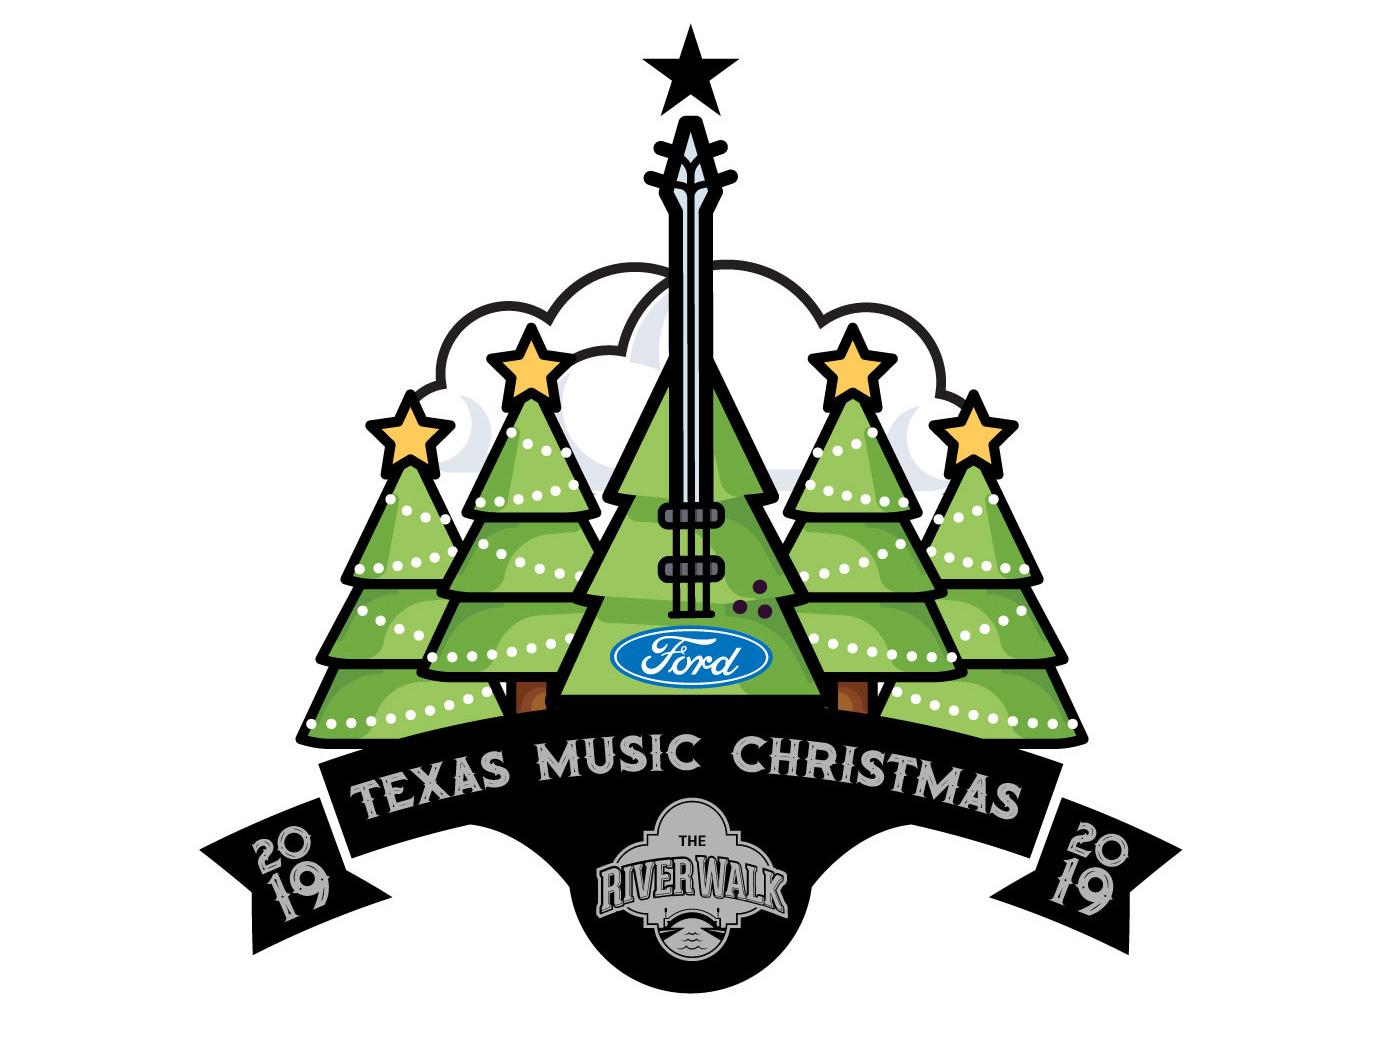 2019 Christmas Music.2019 Texas Music Christmas Holiday Parade Logo By Eleazar